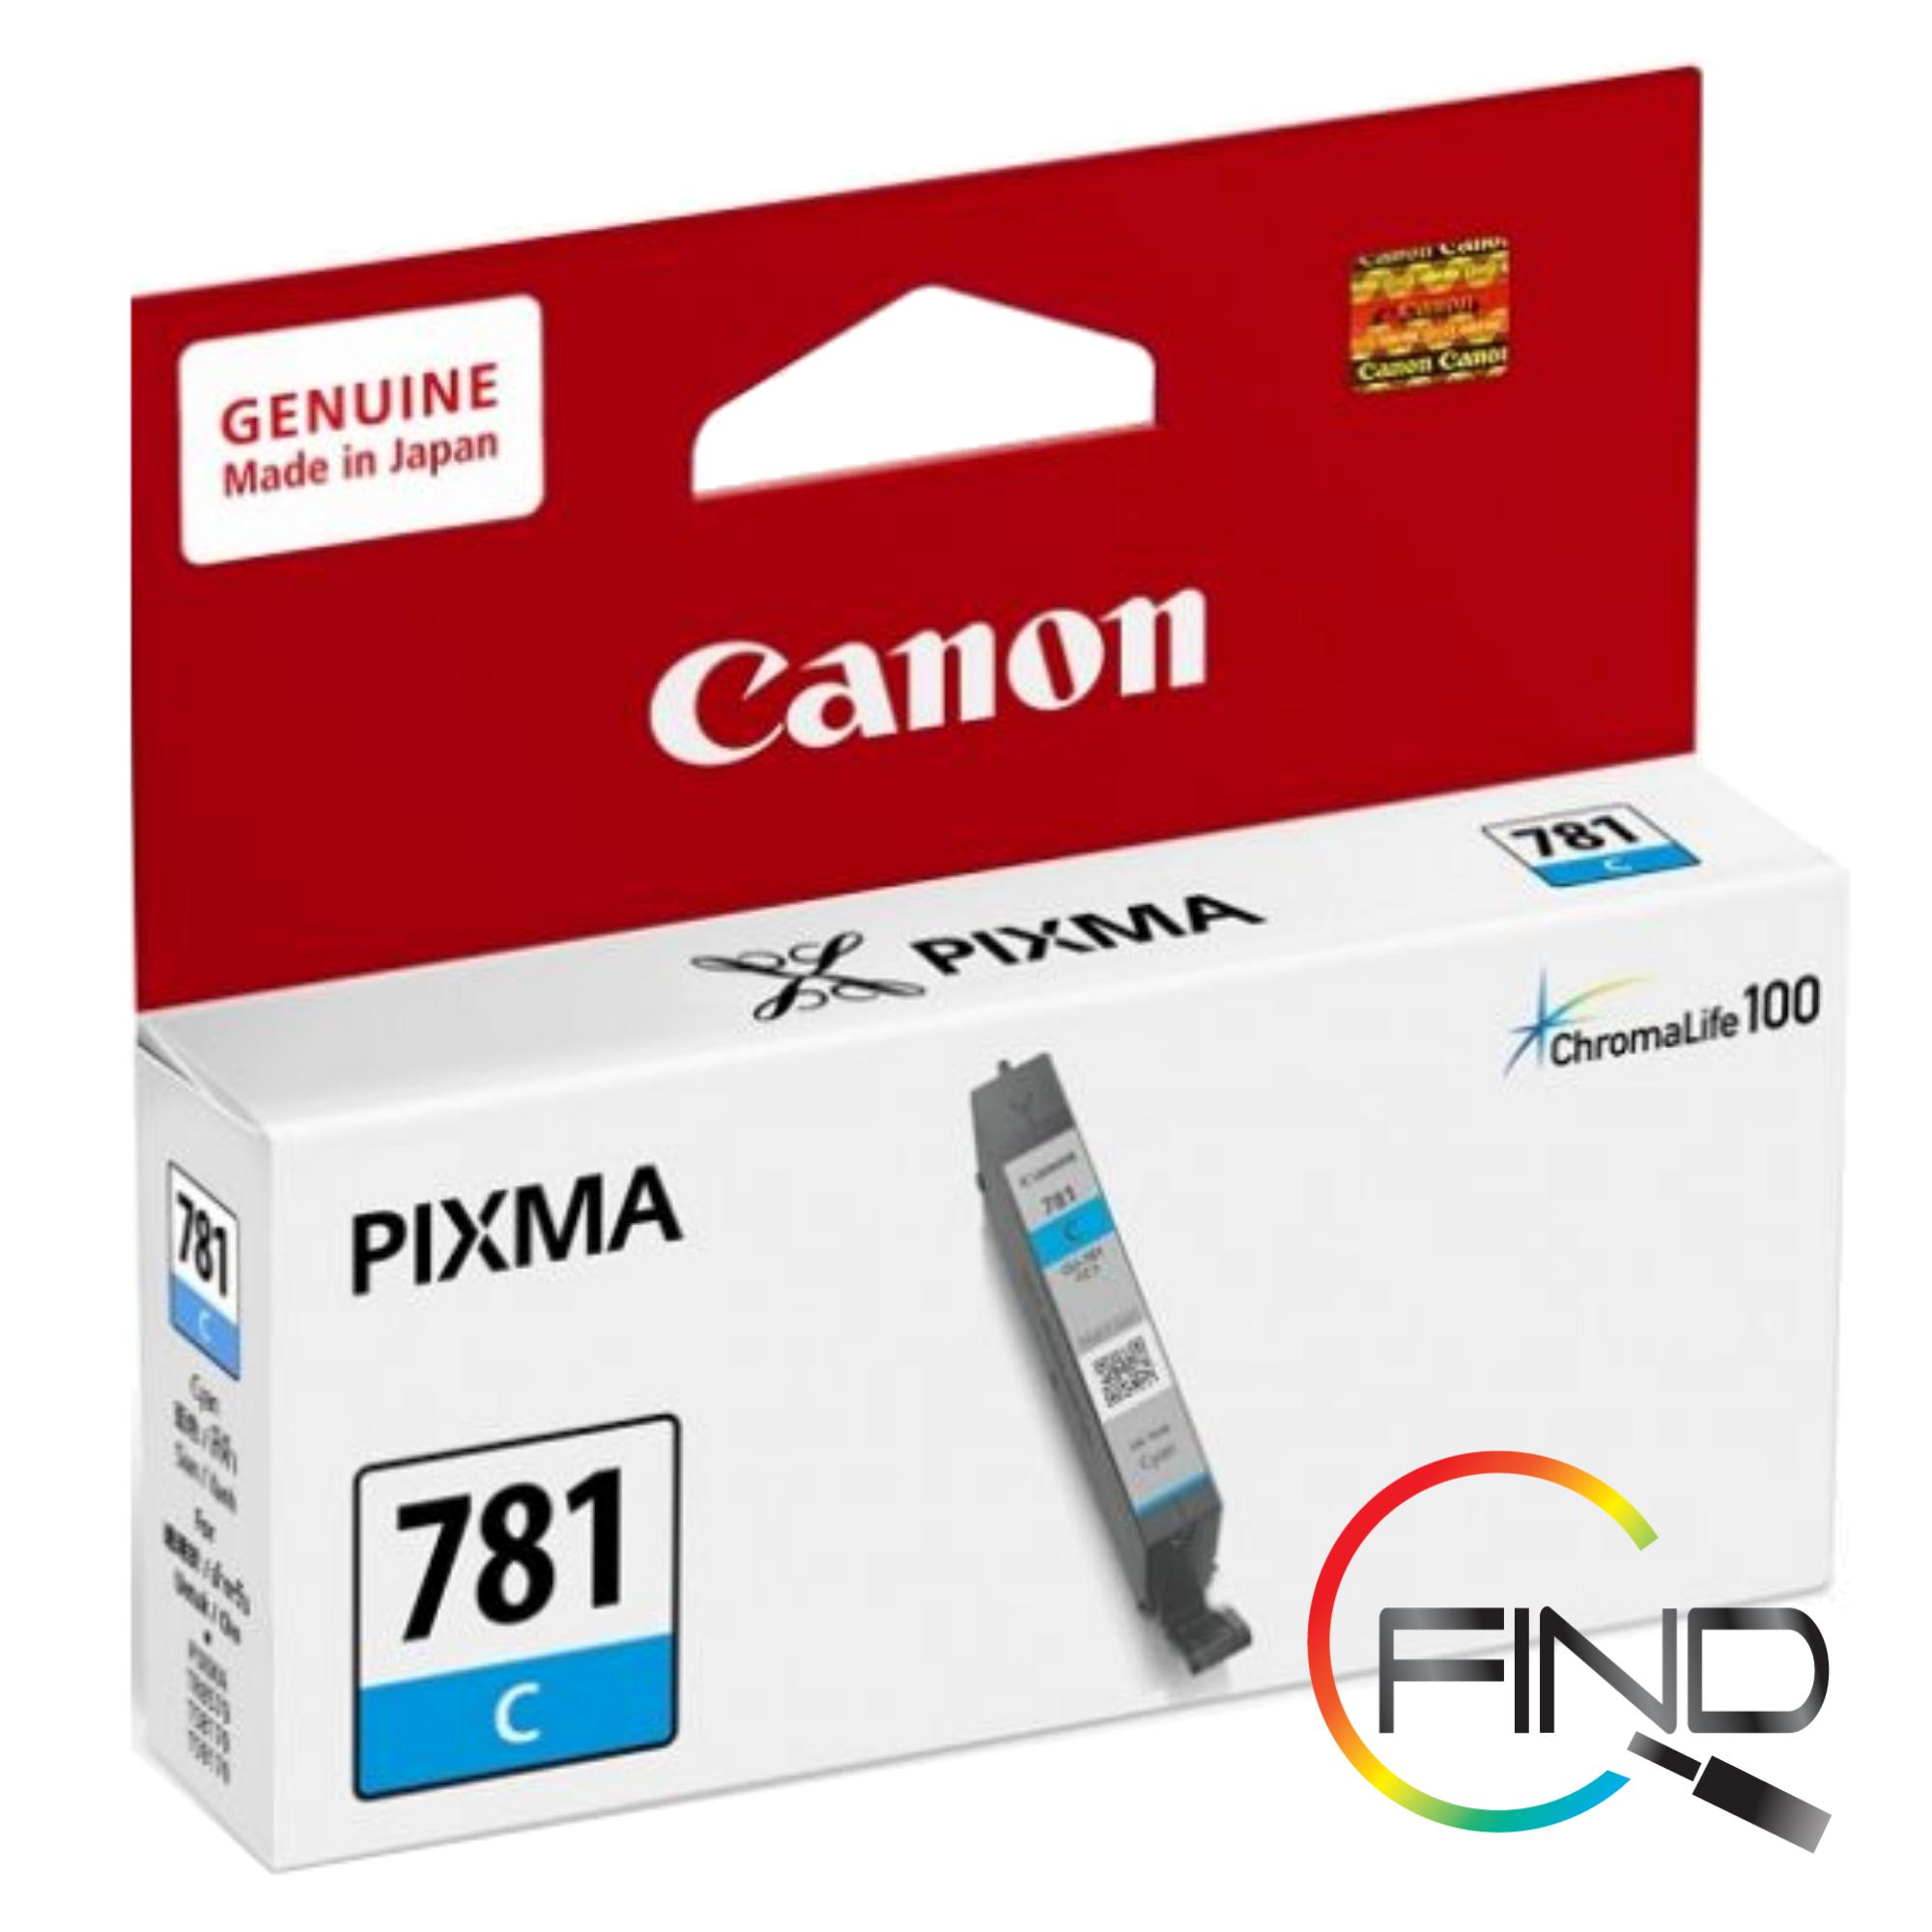 CANON CLI-781 CYAN CARTRIDGE (5.6ml) for TS707, TS8170/TS8270/TS8370/TS9170/TS9570, TR8570 Printer